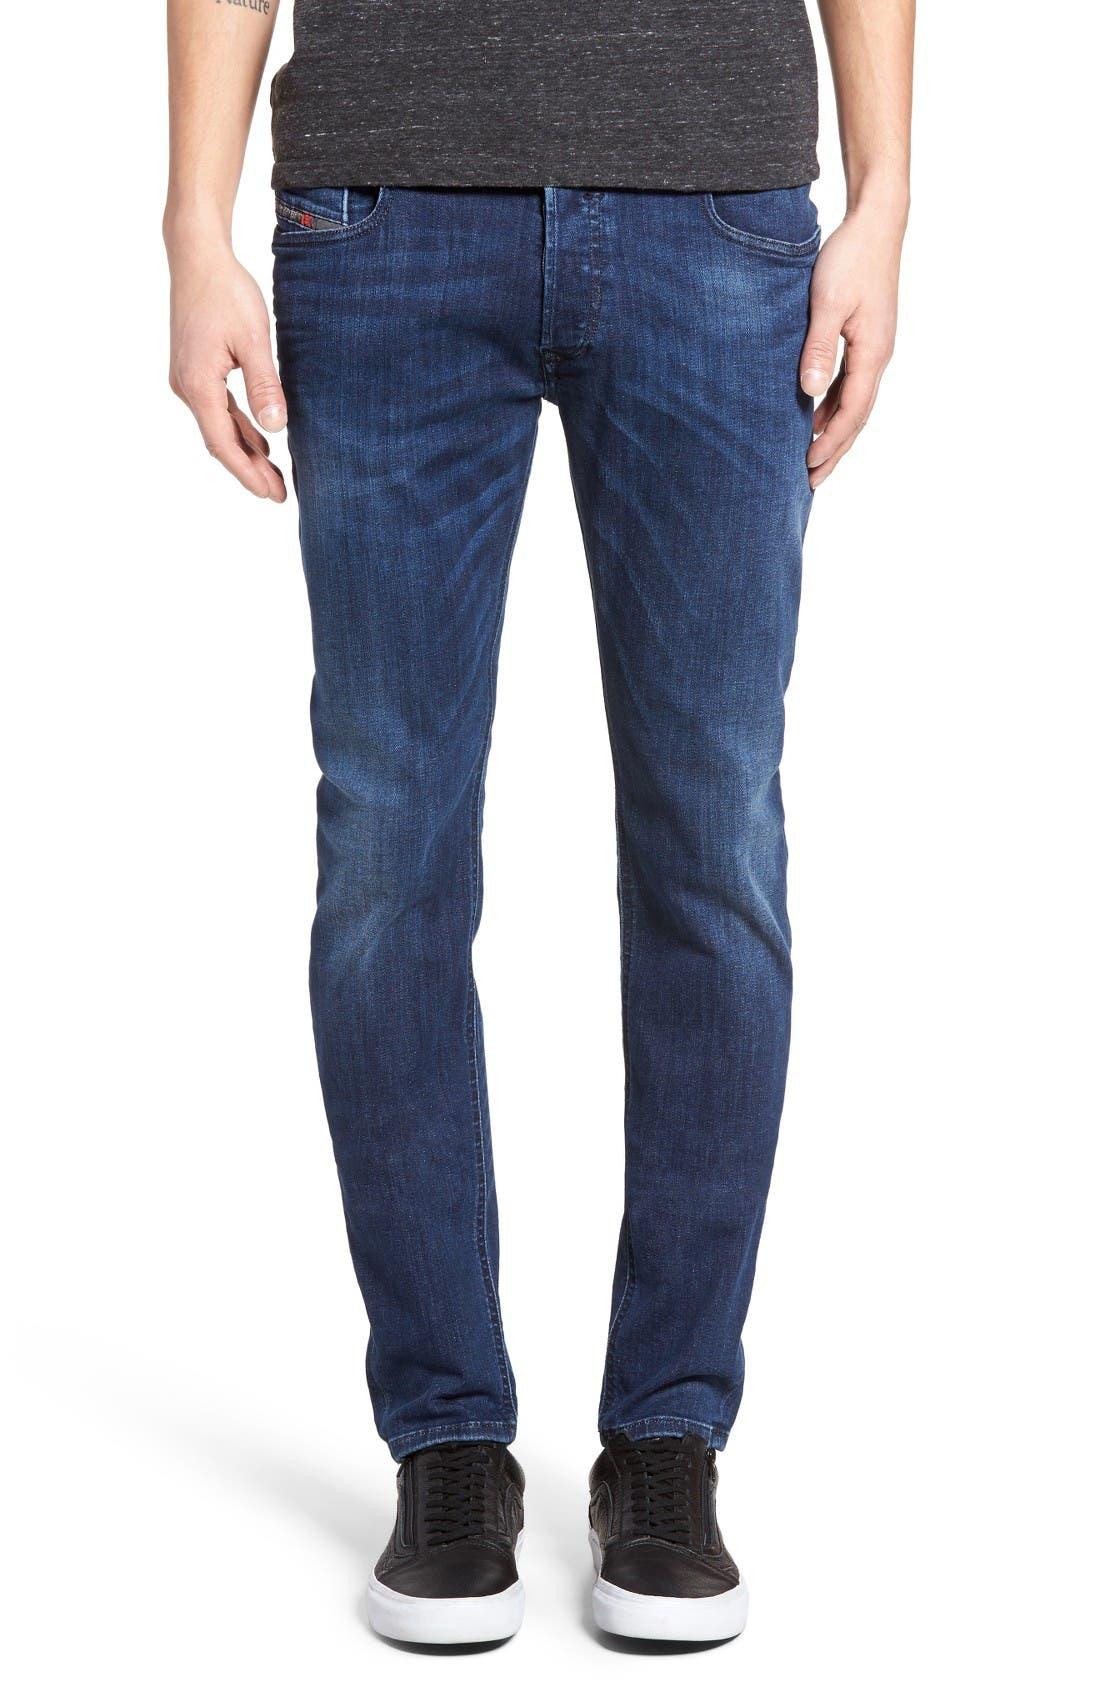 Sleenker Skinny Fit Jeans,                         Main,                         color, 0679K